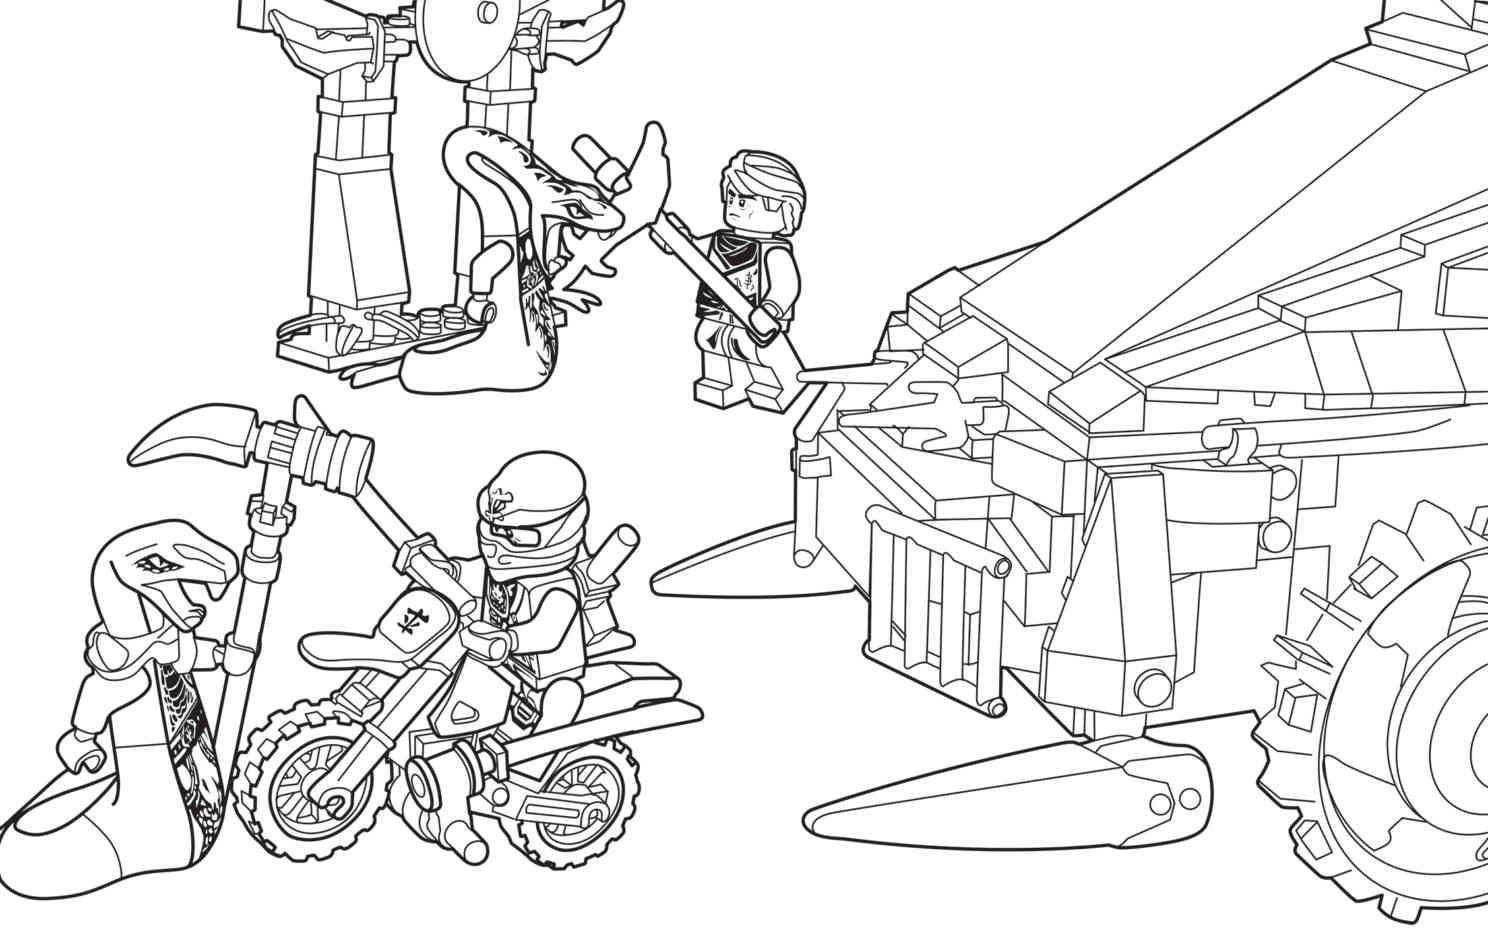 Lego Ausmalbilder Ninjago  Ausmalbilder LEGO NINJAGO LEGO DE